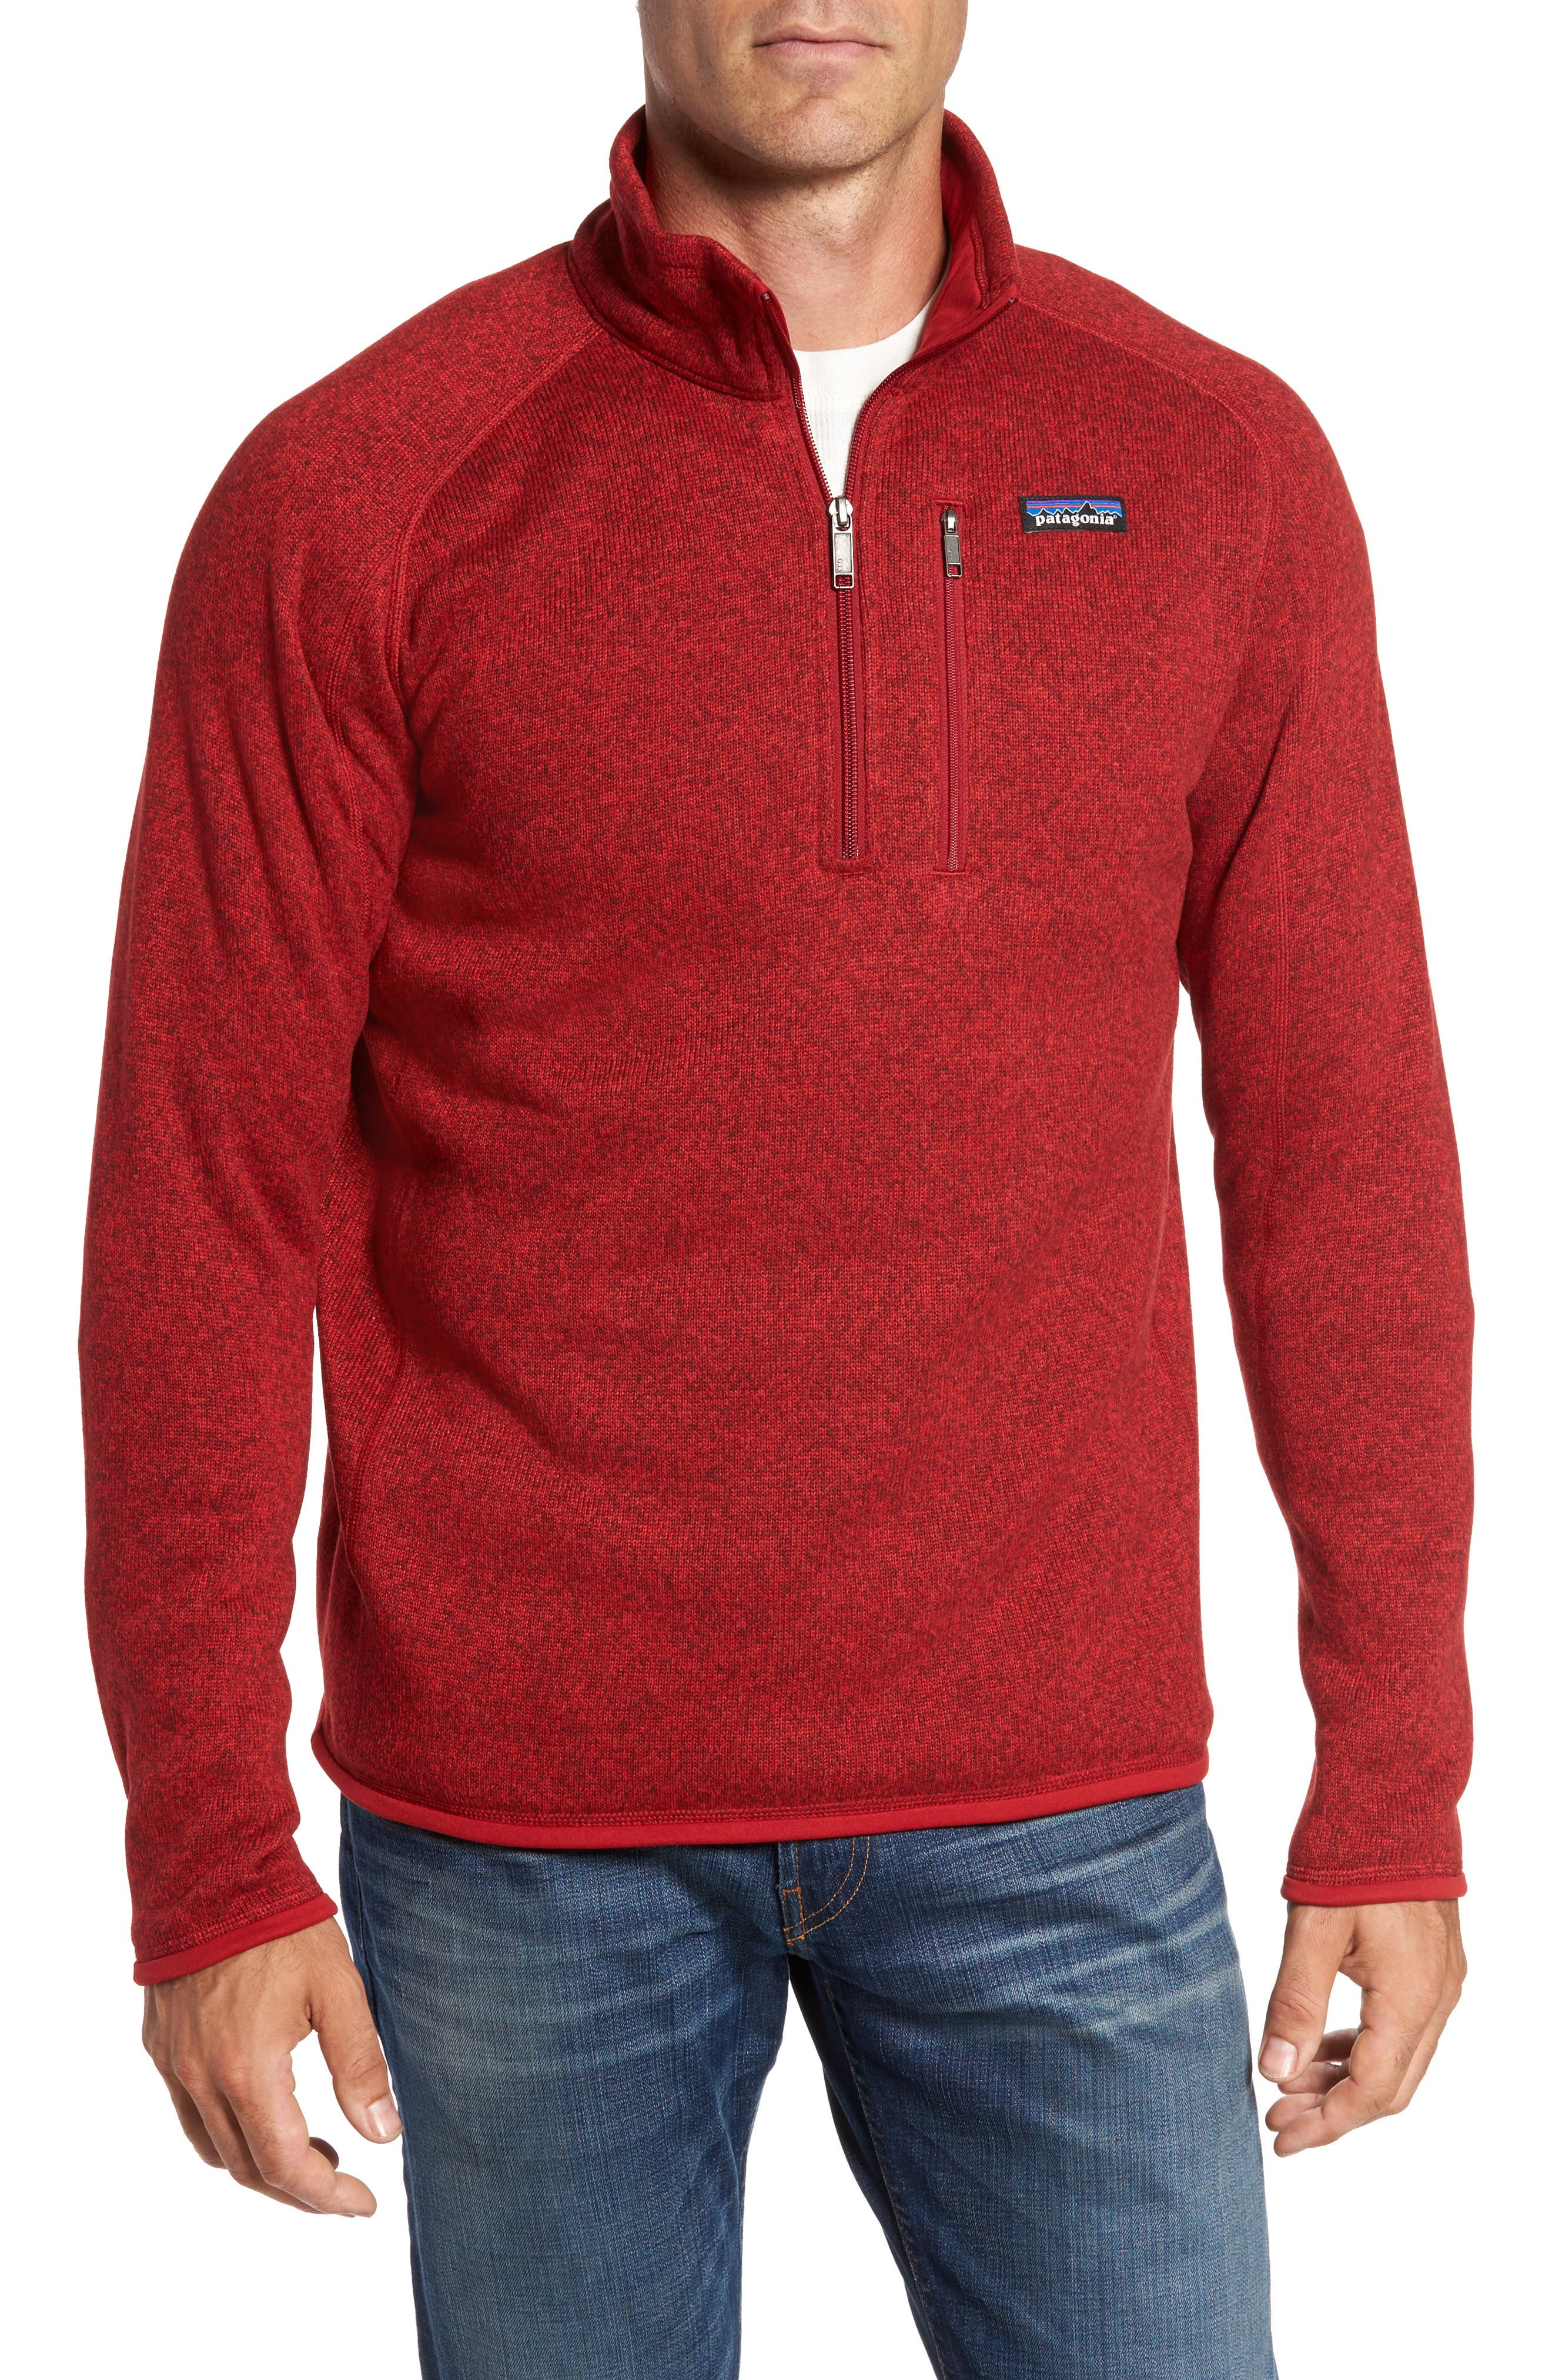 Alternate Image 1 Selected - Patagonia 'Better Sweater' Quarter Zip Pullover